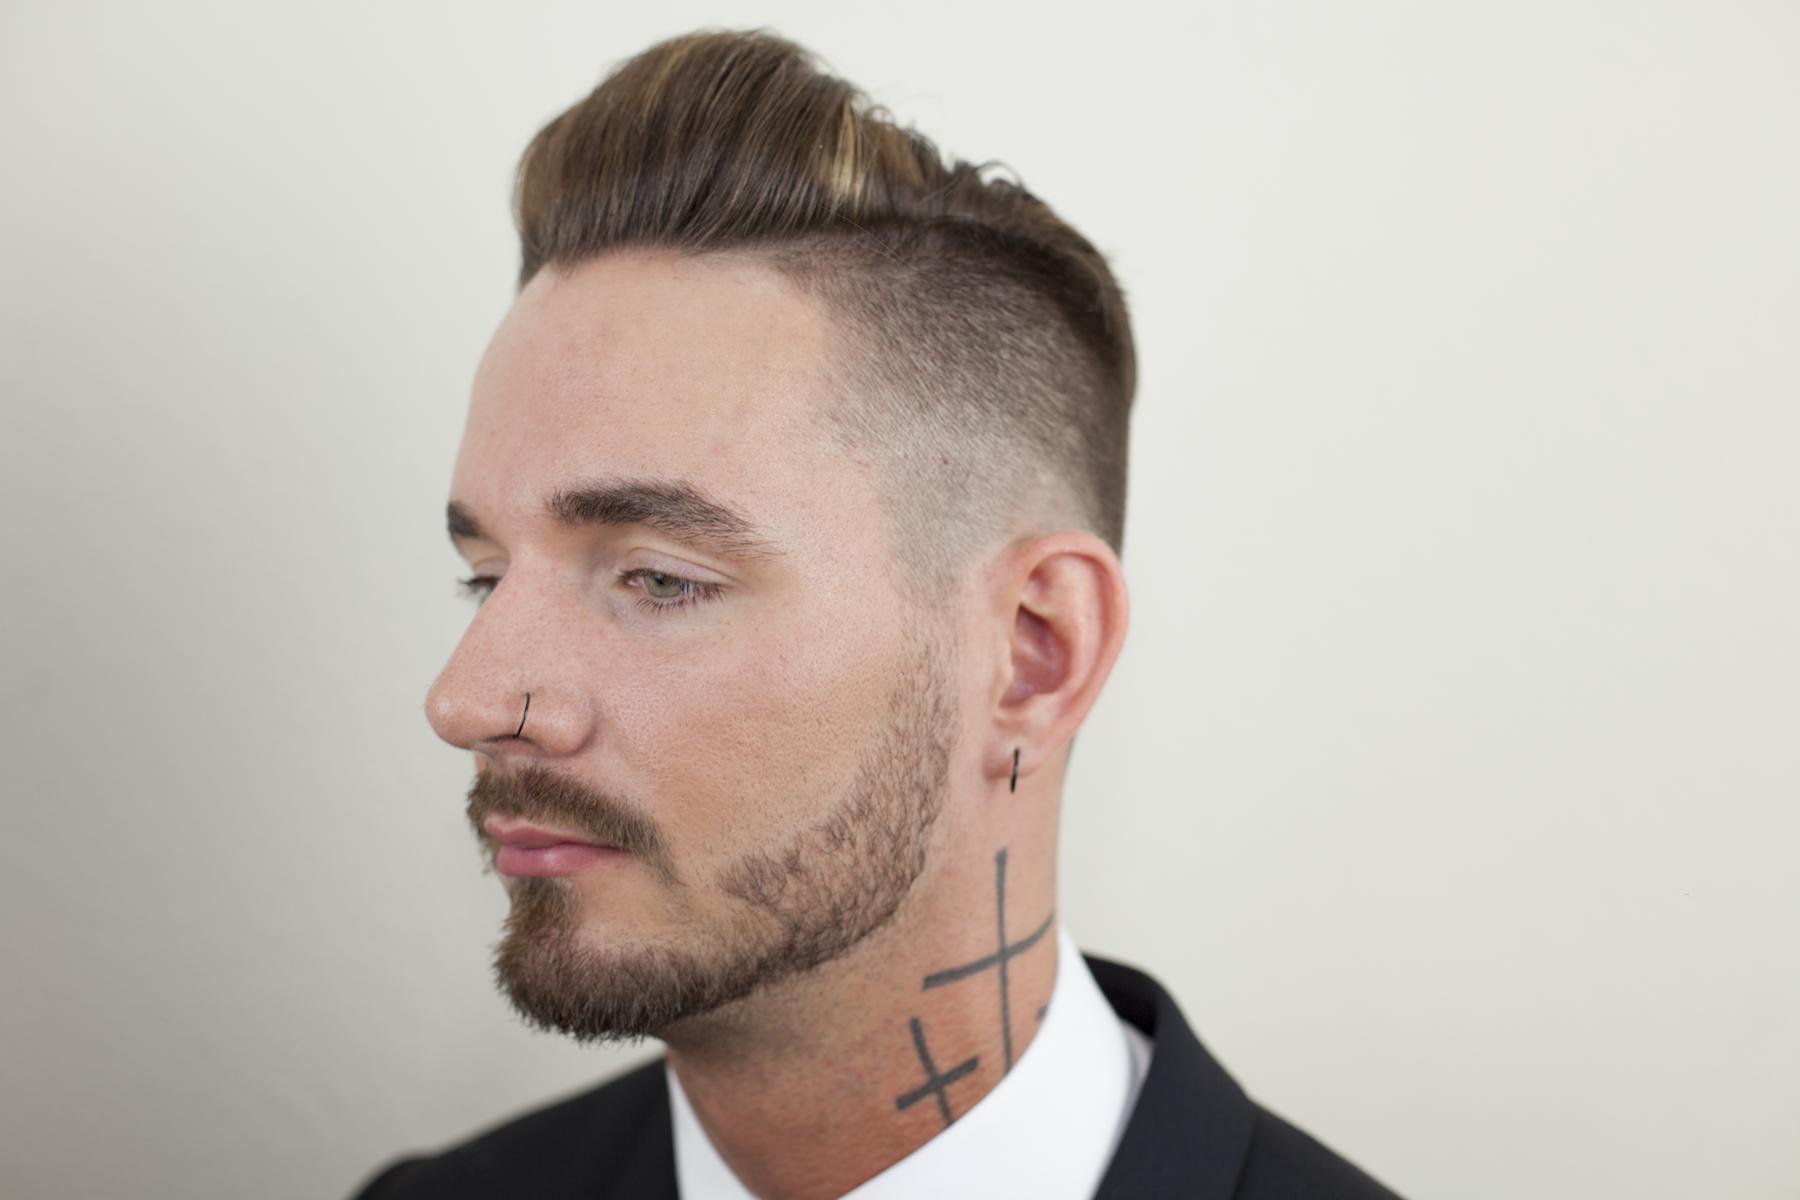 Haircut In Plano Carrollton Allen